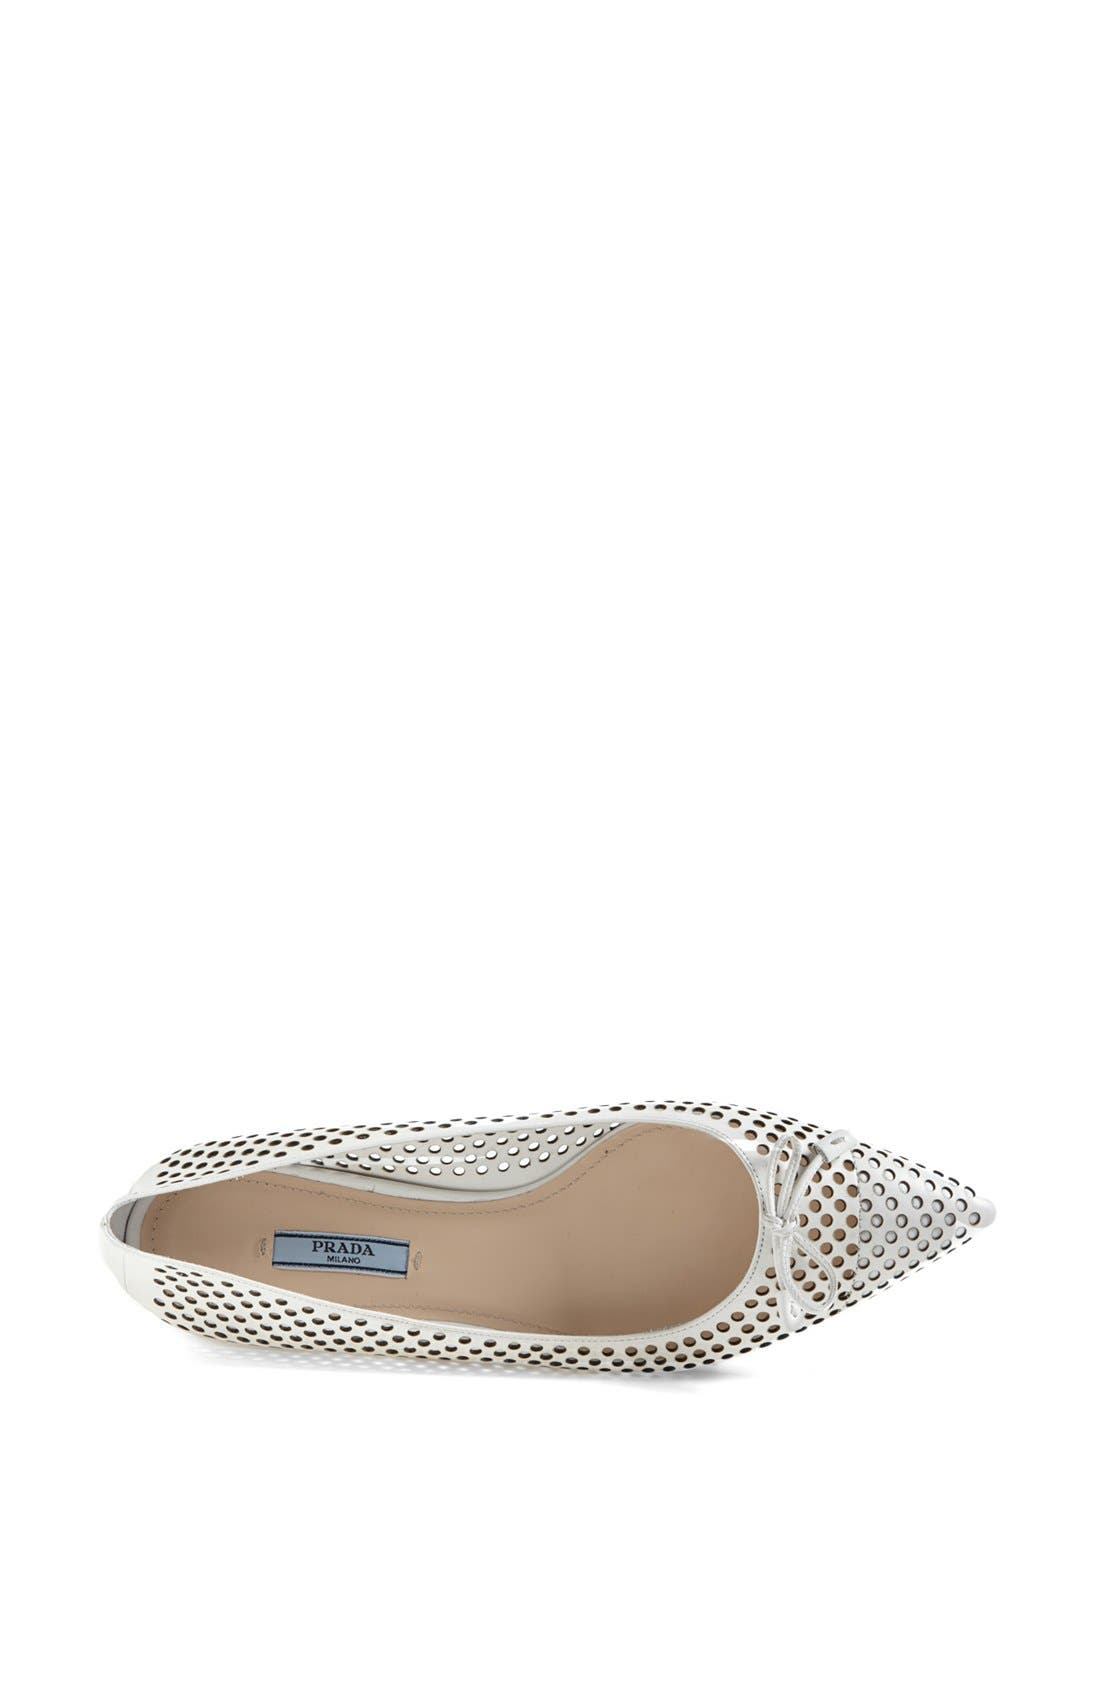 Alternate Image 3  - Prada Pointed Toe Perforated Ballet Flat